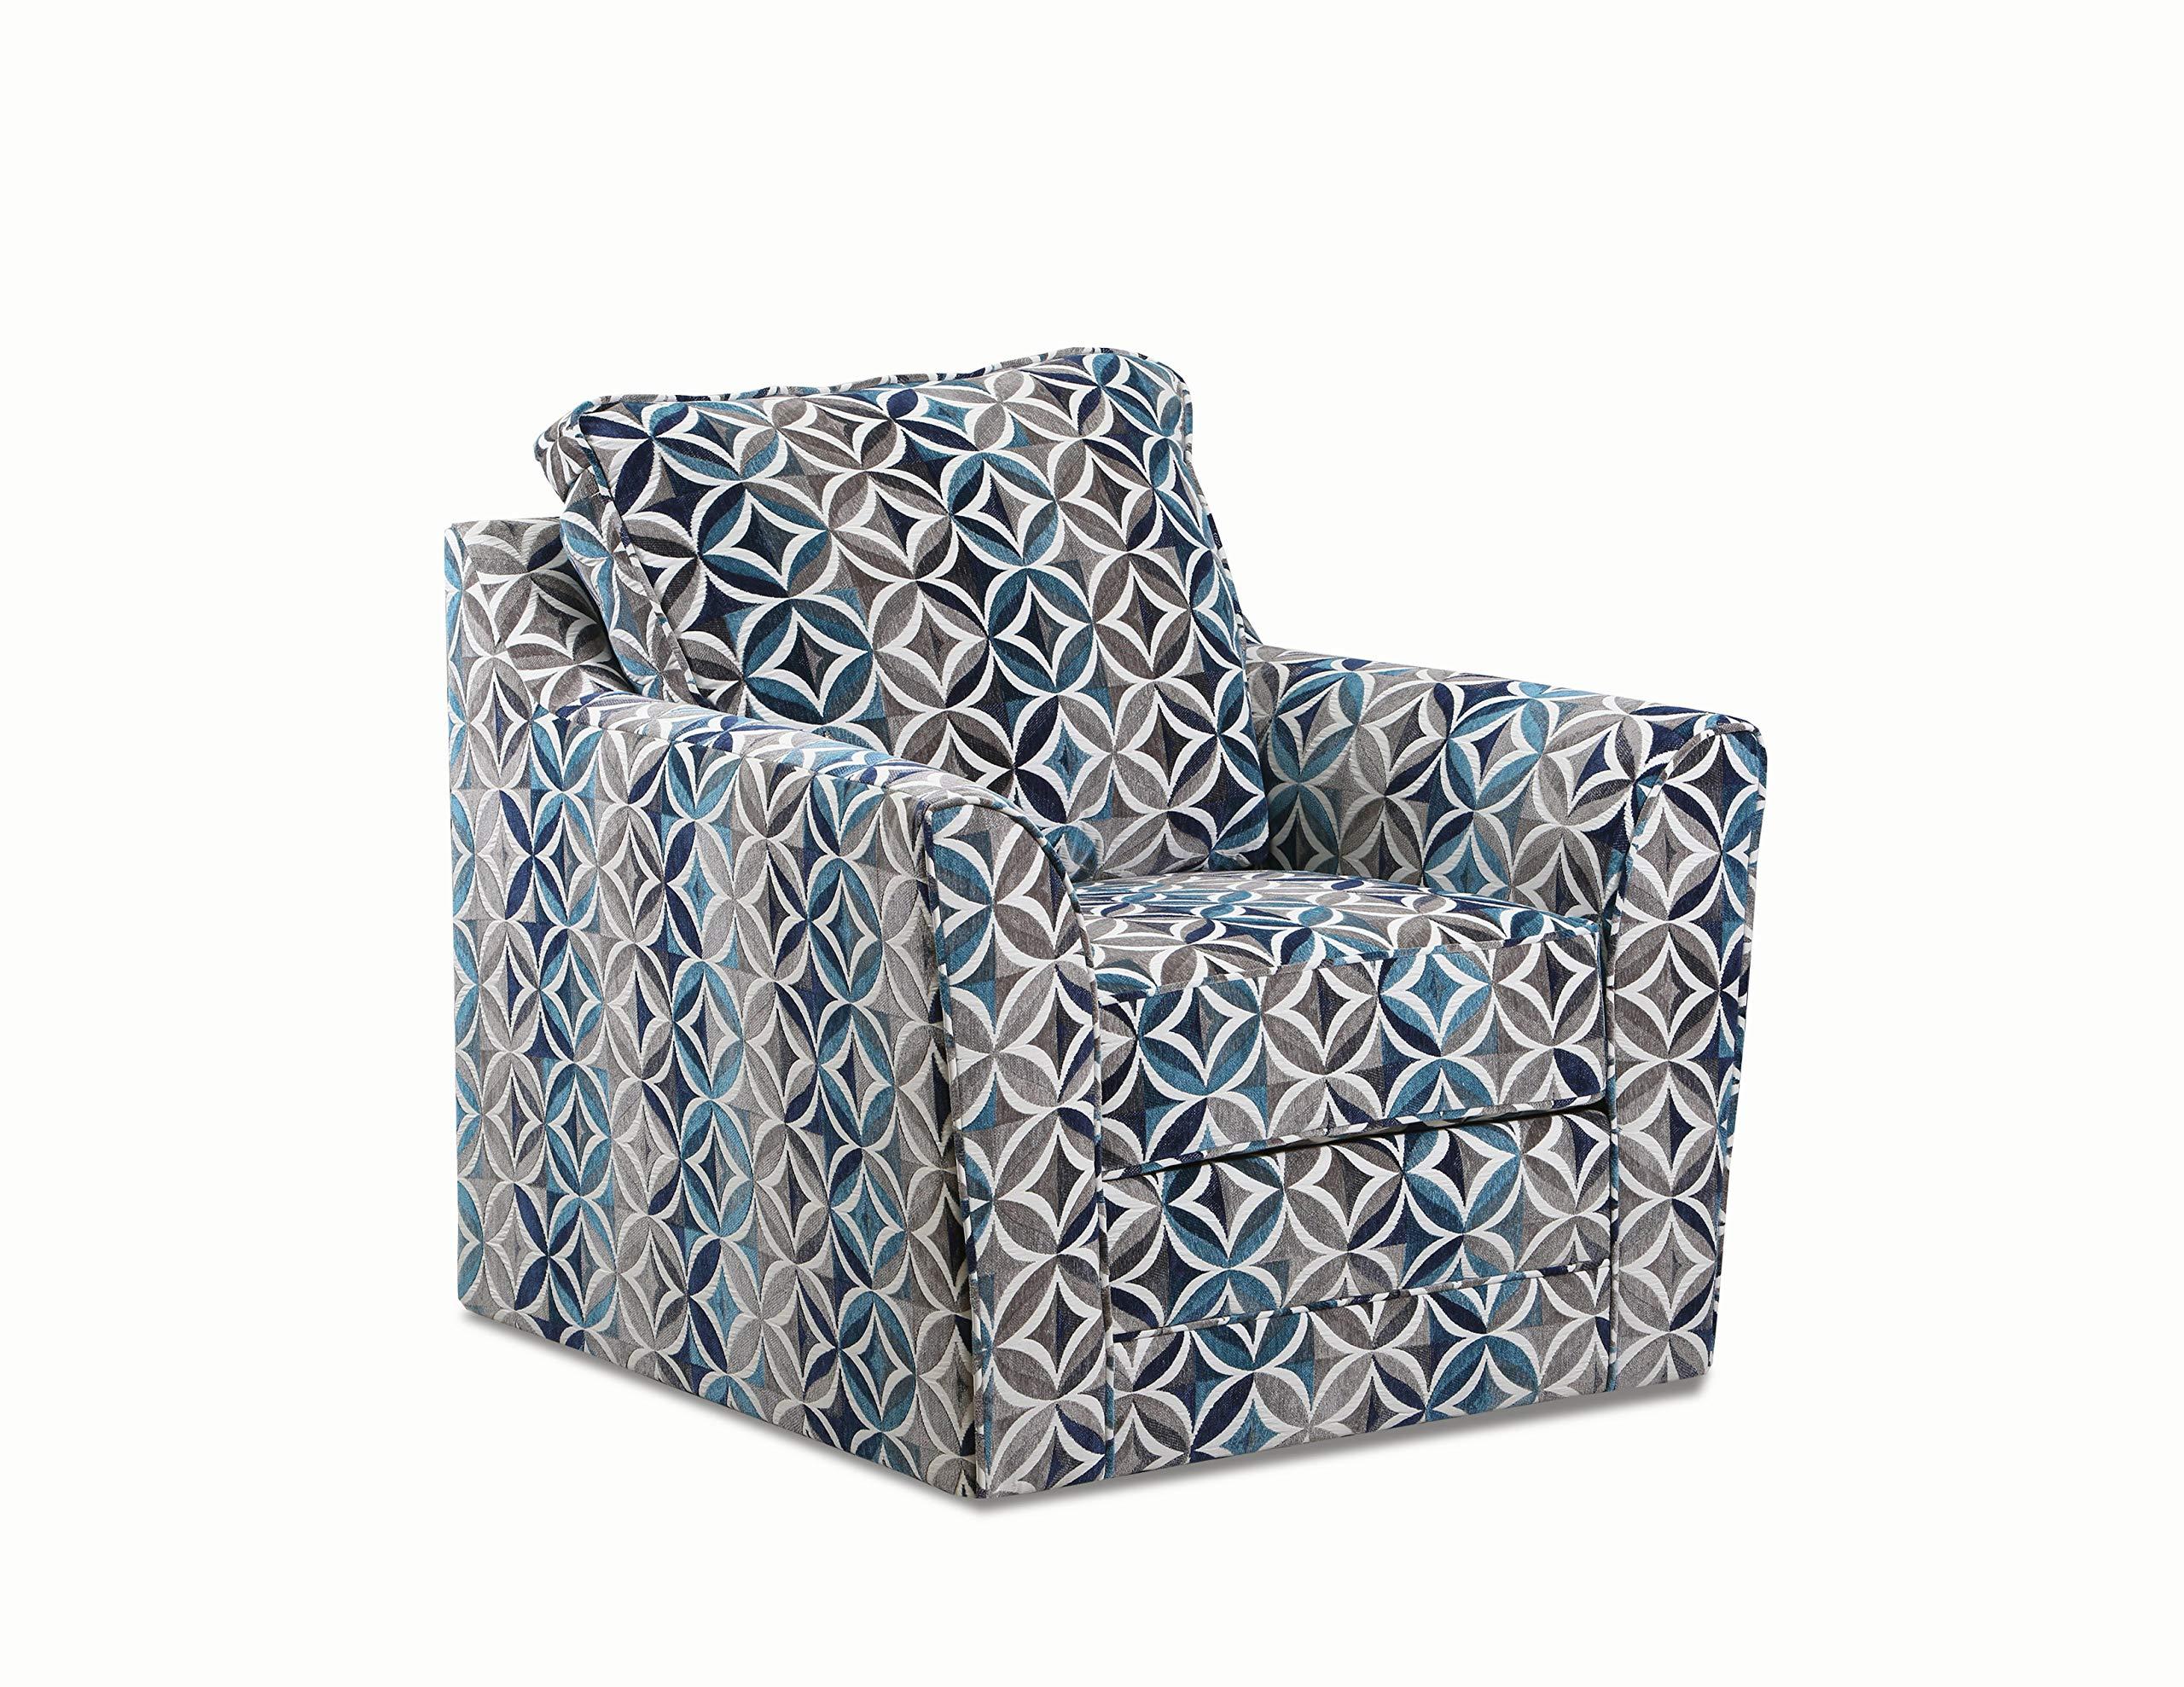 Lane Home Furnishings 2013-01S Terrazzo Pacific Swivel Chair, Multi-Color by Lane Home Furnishings